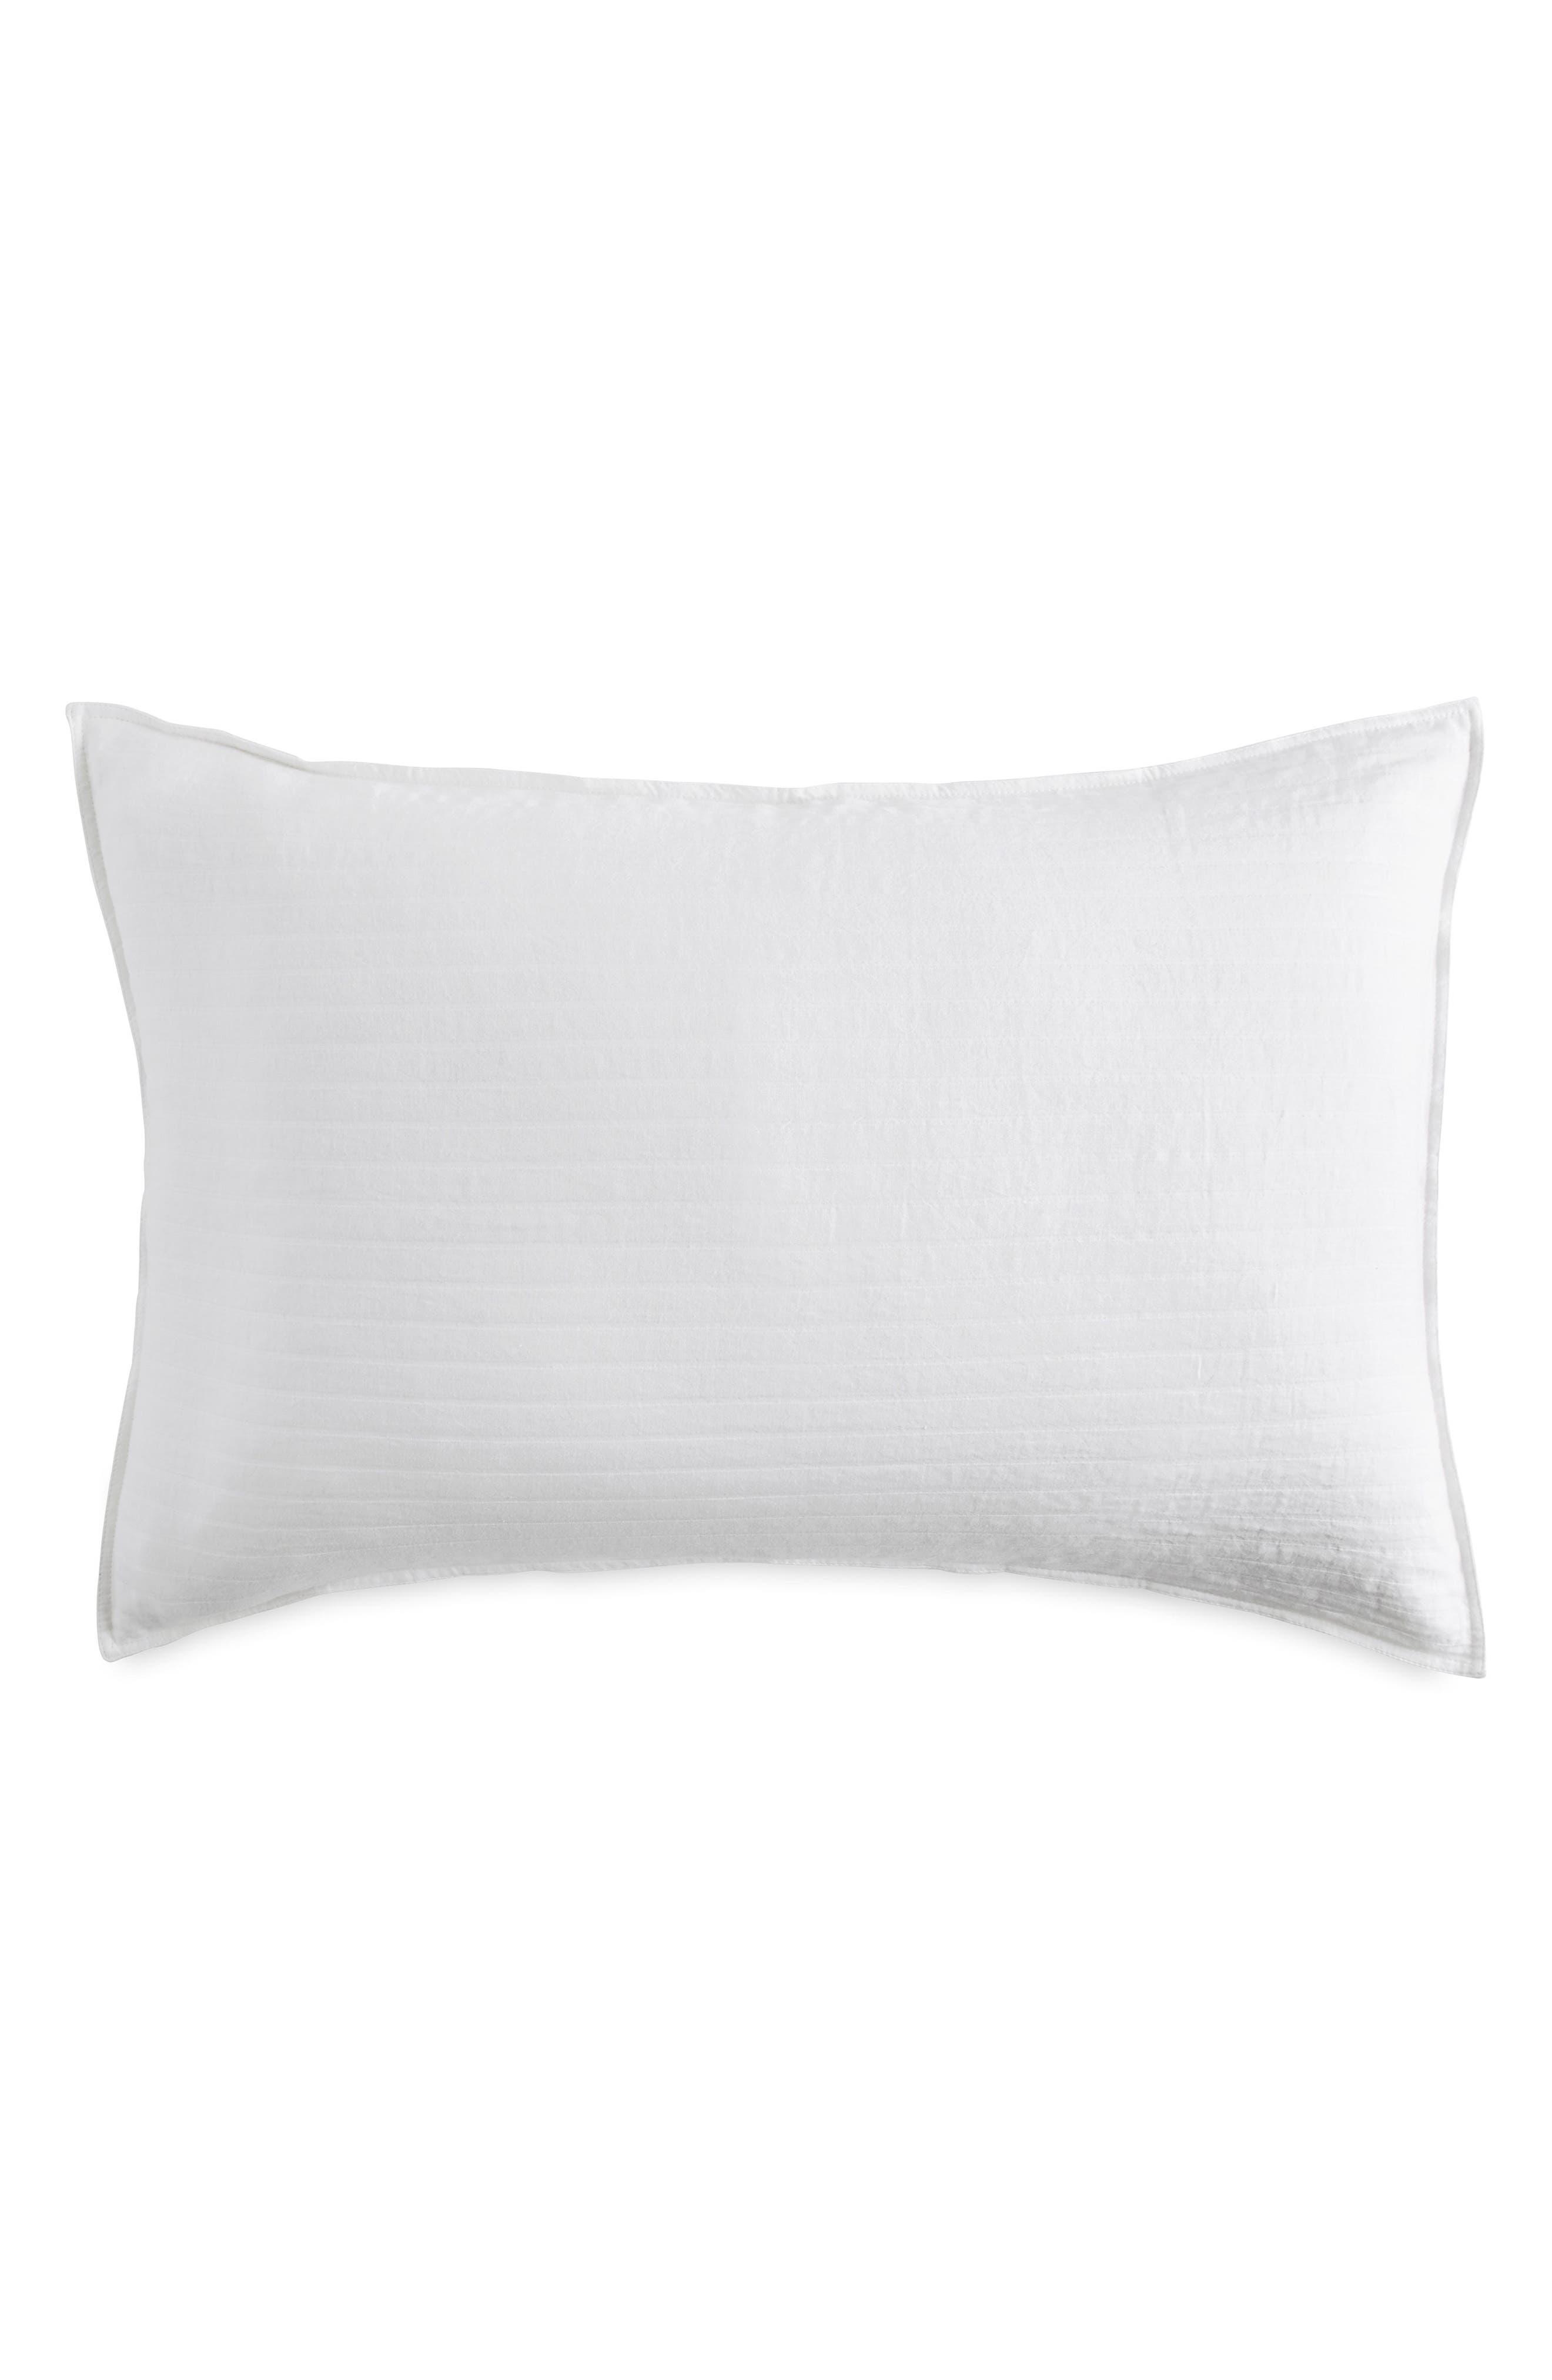 DKNY, PURE Comfy White Pillow Sham, Main thumbnail 1, color, WHITE